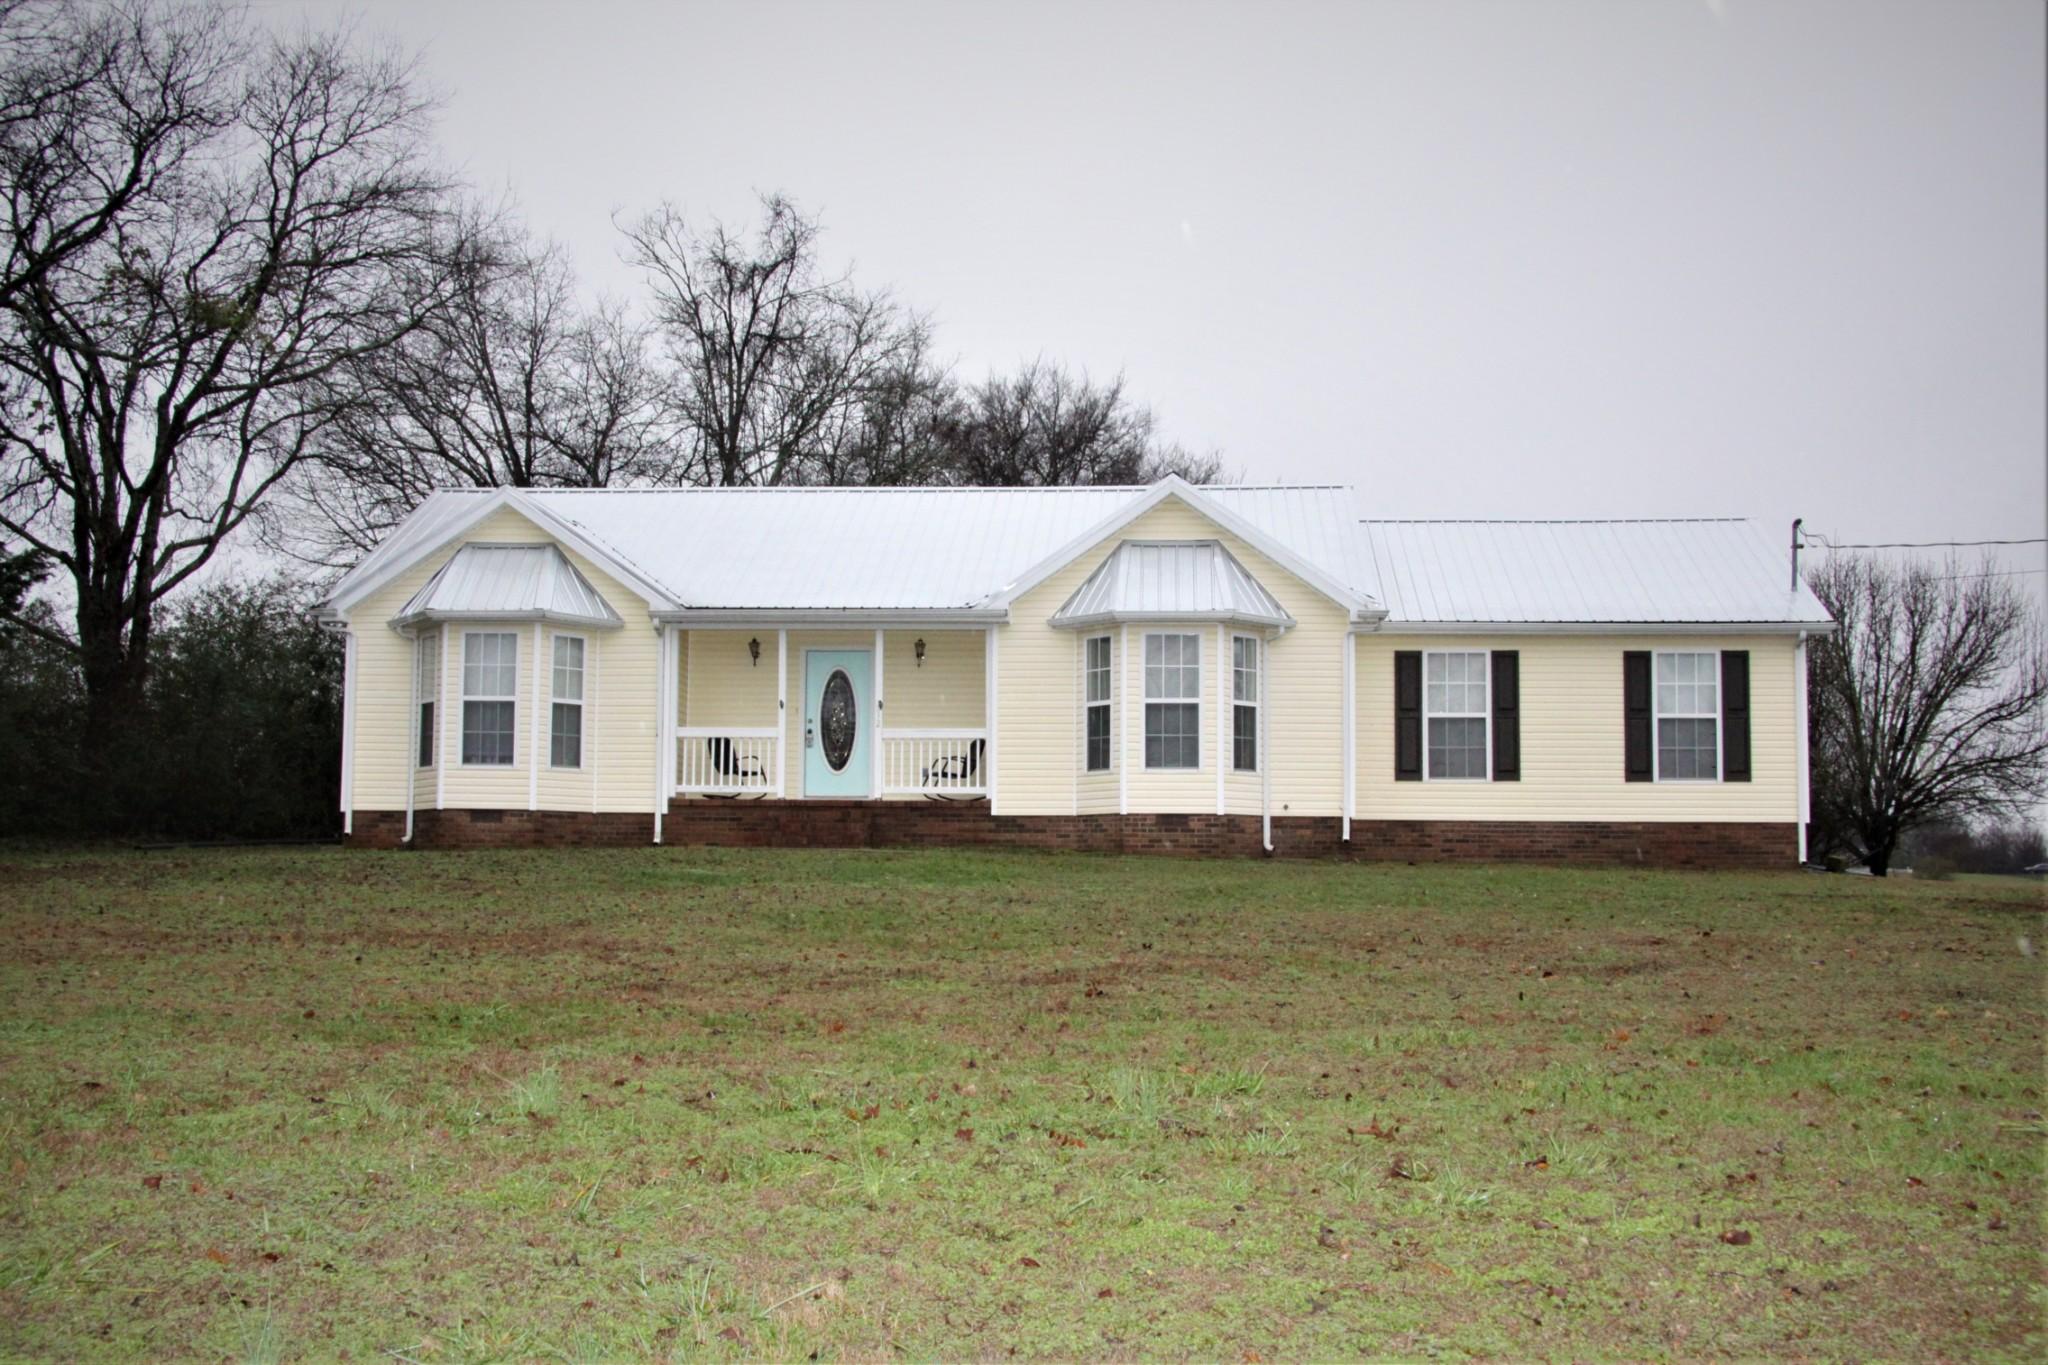 112 Amy Lane, Unionville, TN 37180 - Unionville, TN real estate listing